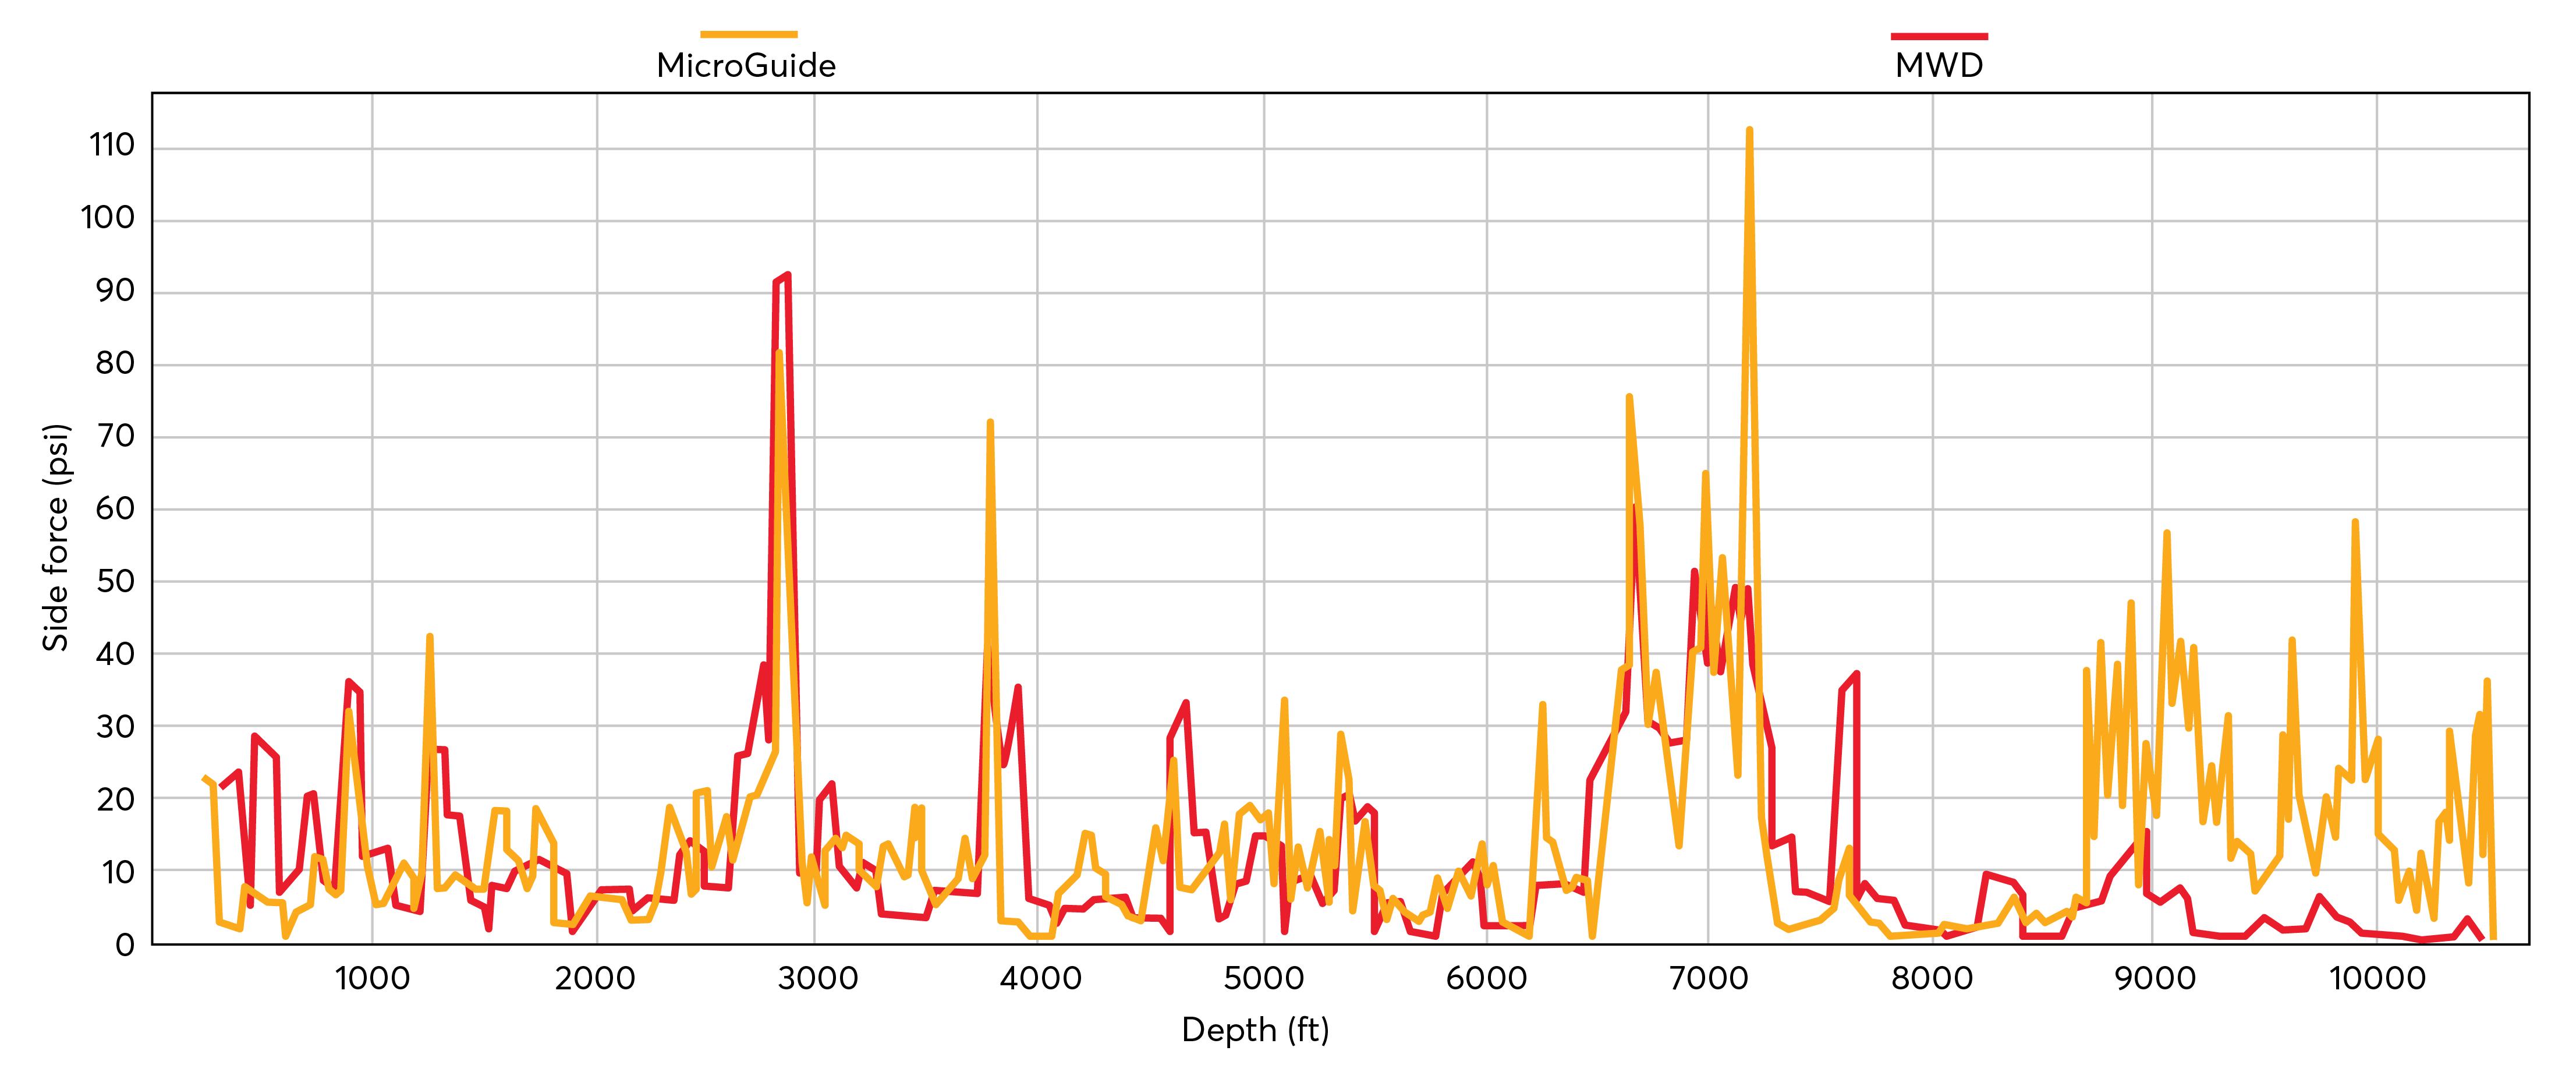 مطالعه موردی Gyrodata MicroGuide Wellbore در شیل Bakken شکل 1